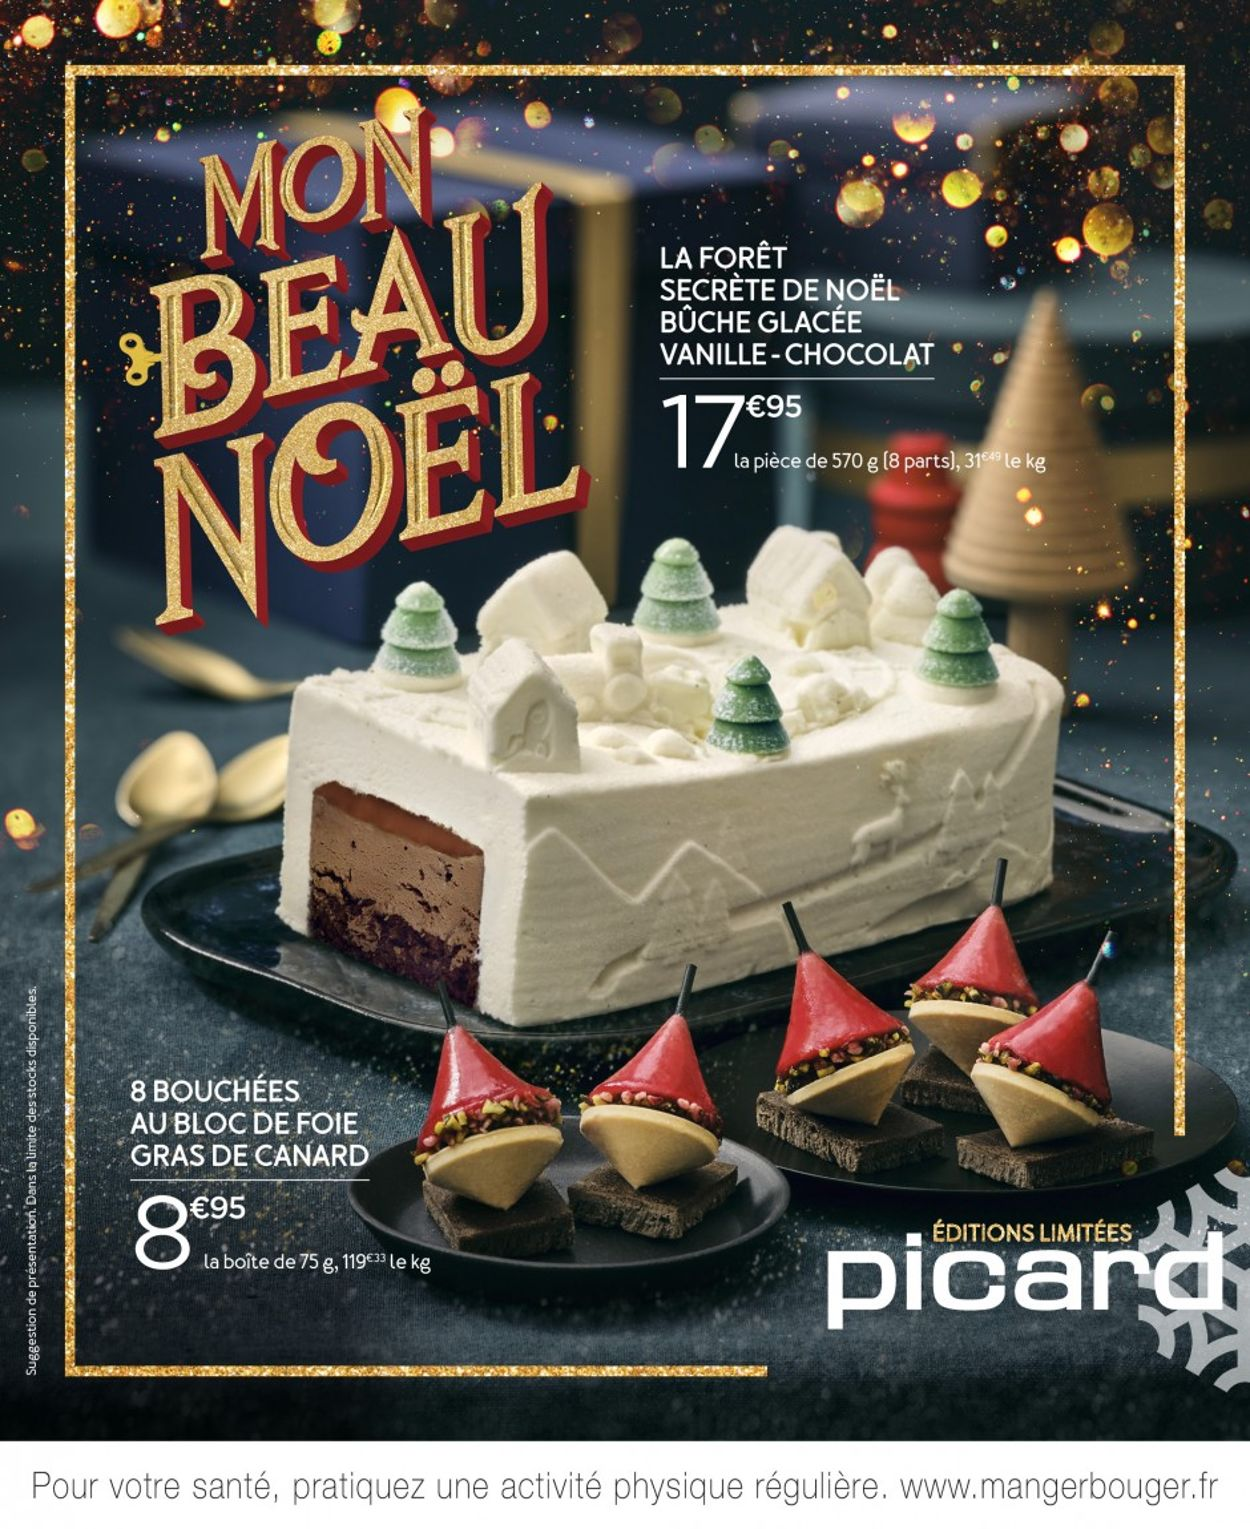 Picard Noel 2020 Catalogue - 07.12-03.01.2021